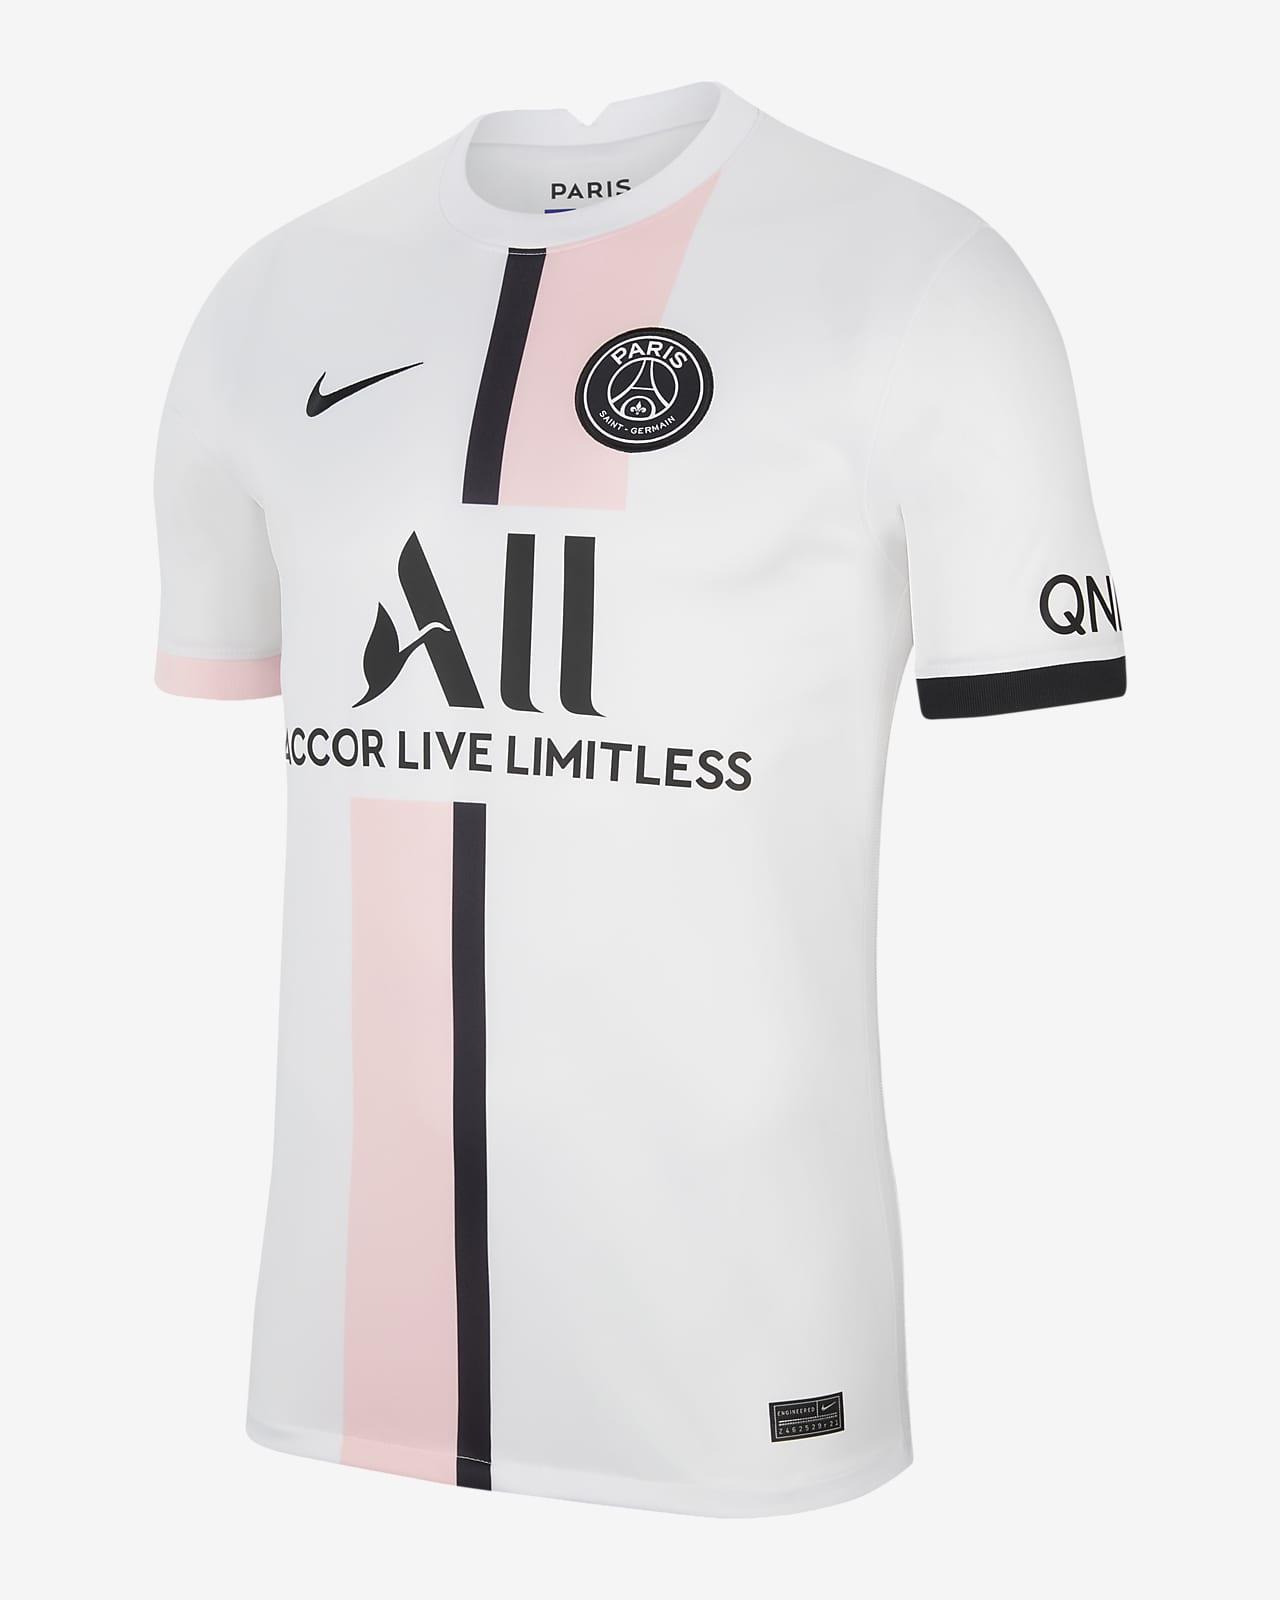 Maglia da calcio Nike Dri-FIT Paris Saint-Germain 2021/22 Stadium da uomo - Away